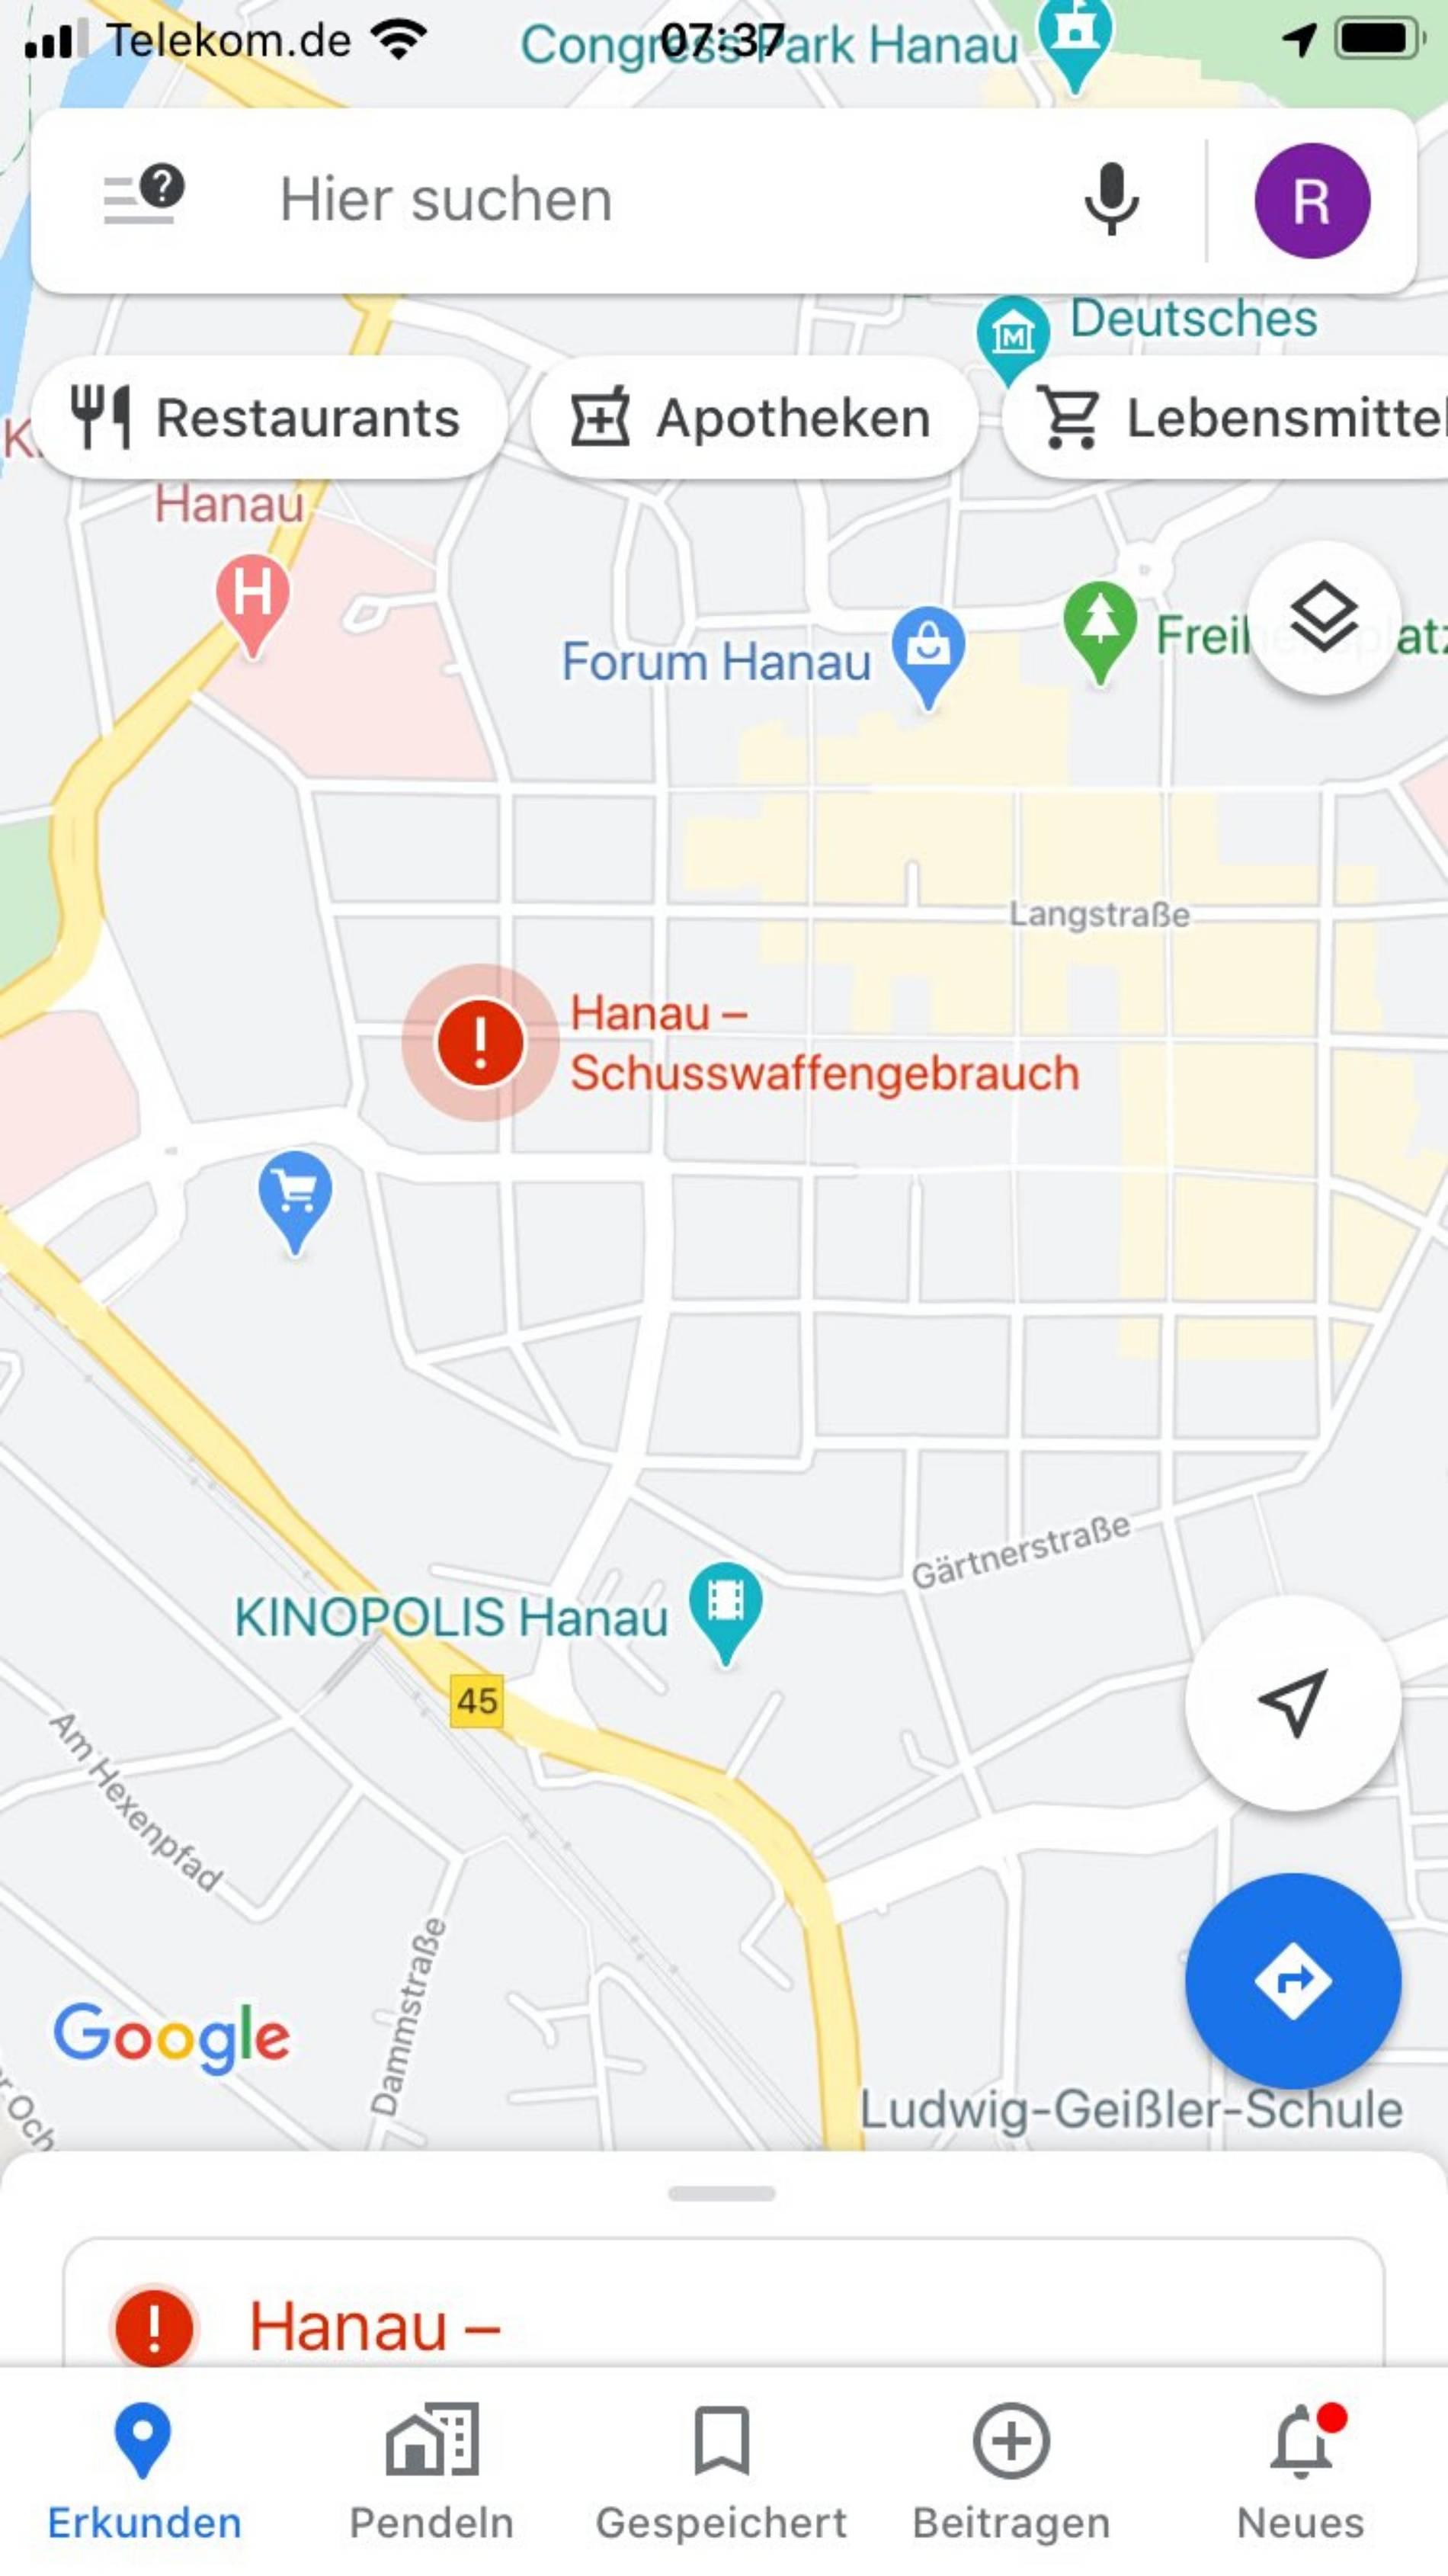 Google Maps Warnung Bei Hanau Anschlag Wie Geht Das